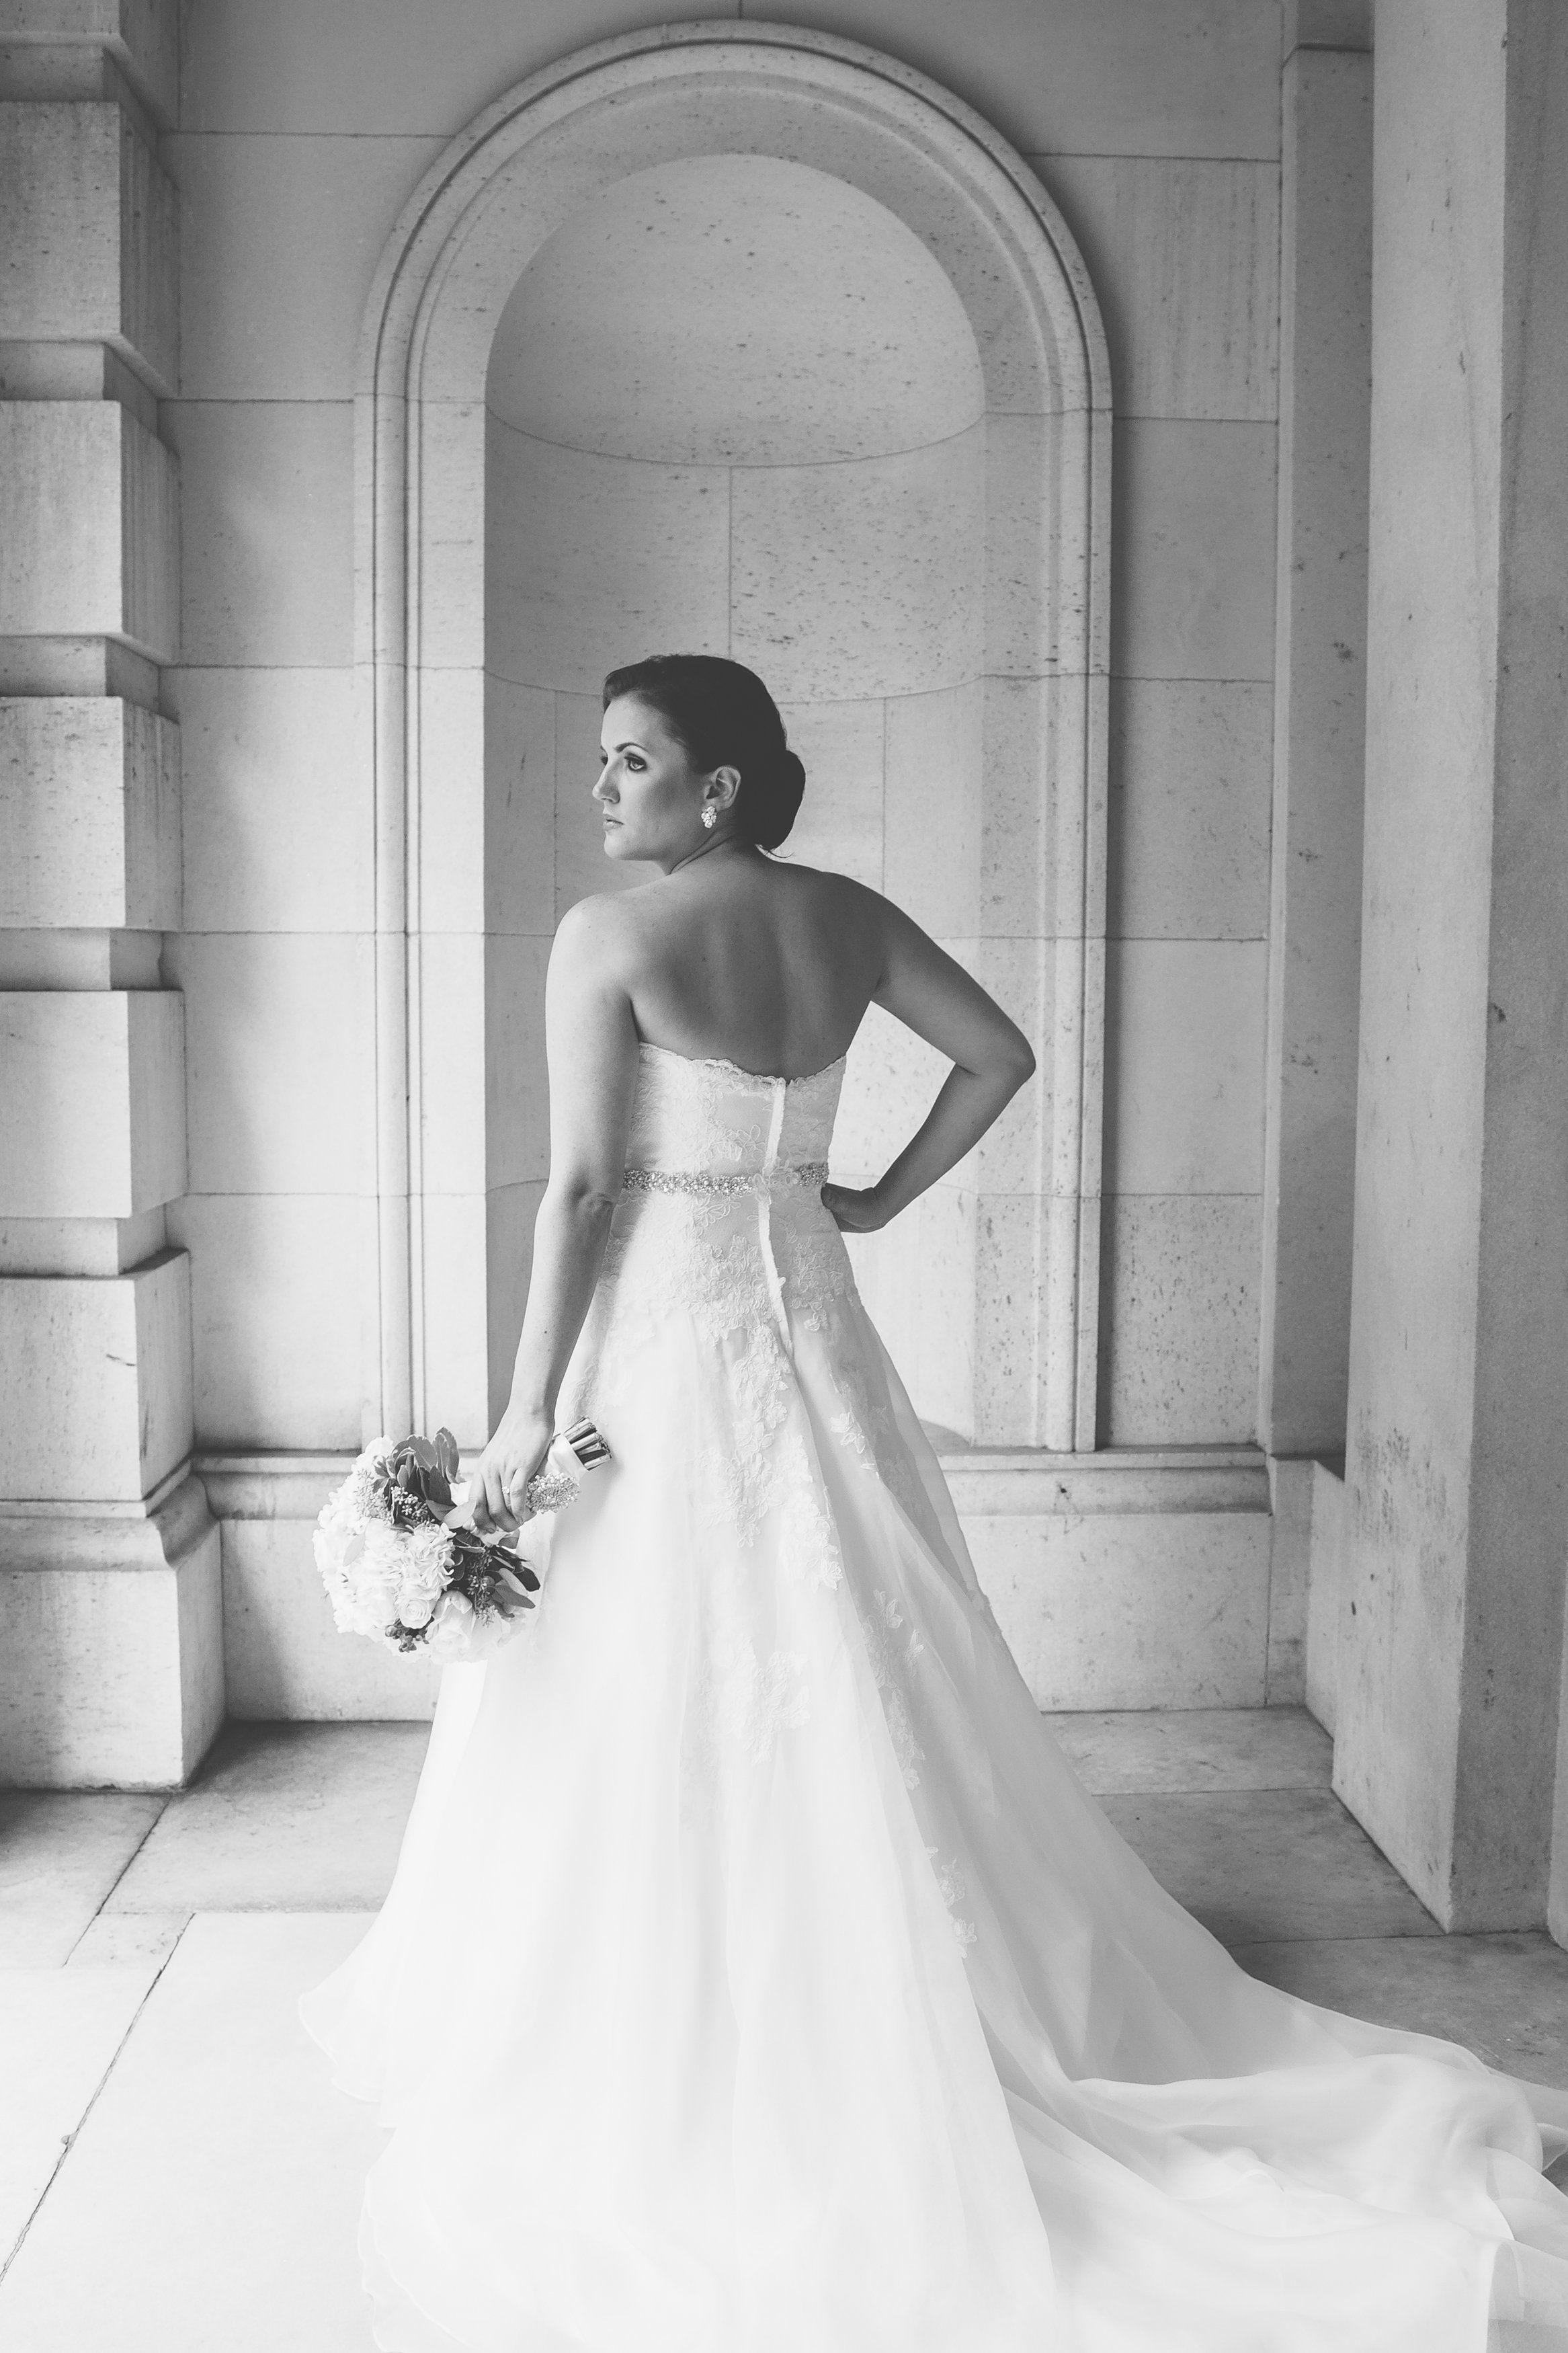 Hotel monaco washington dc picture location ideas xues hotel monaco washington dc picture location ideas wedding dressesbridal ombrellifo Choice Image